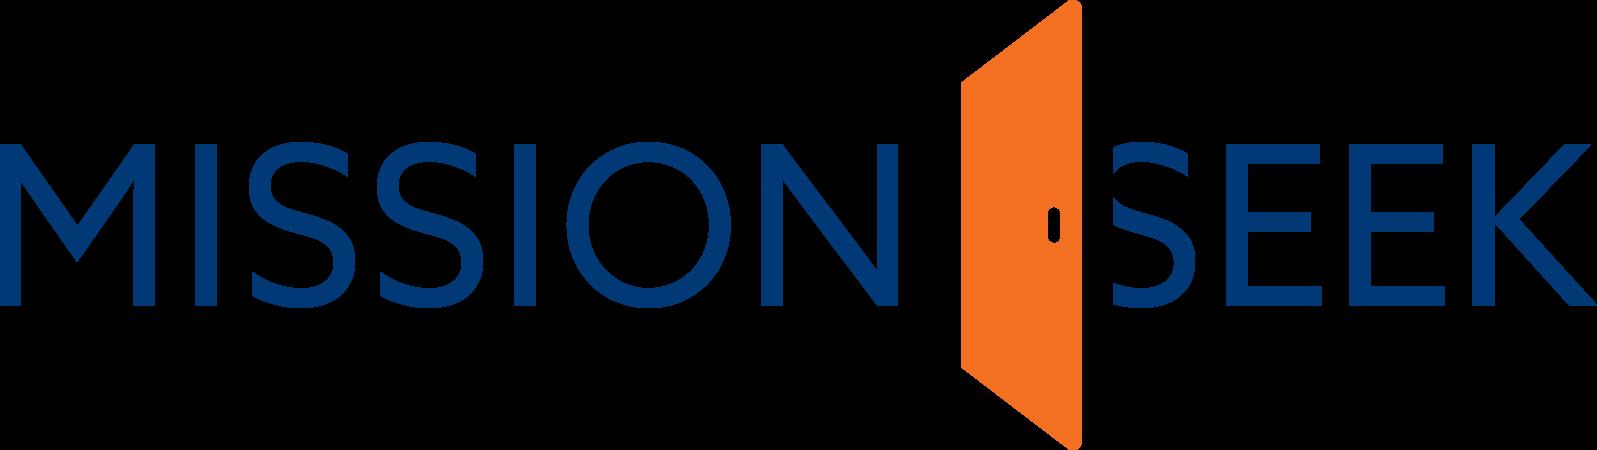 Mission-Seek-Logo.png